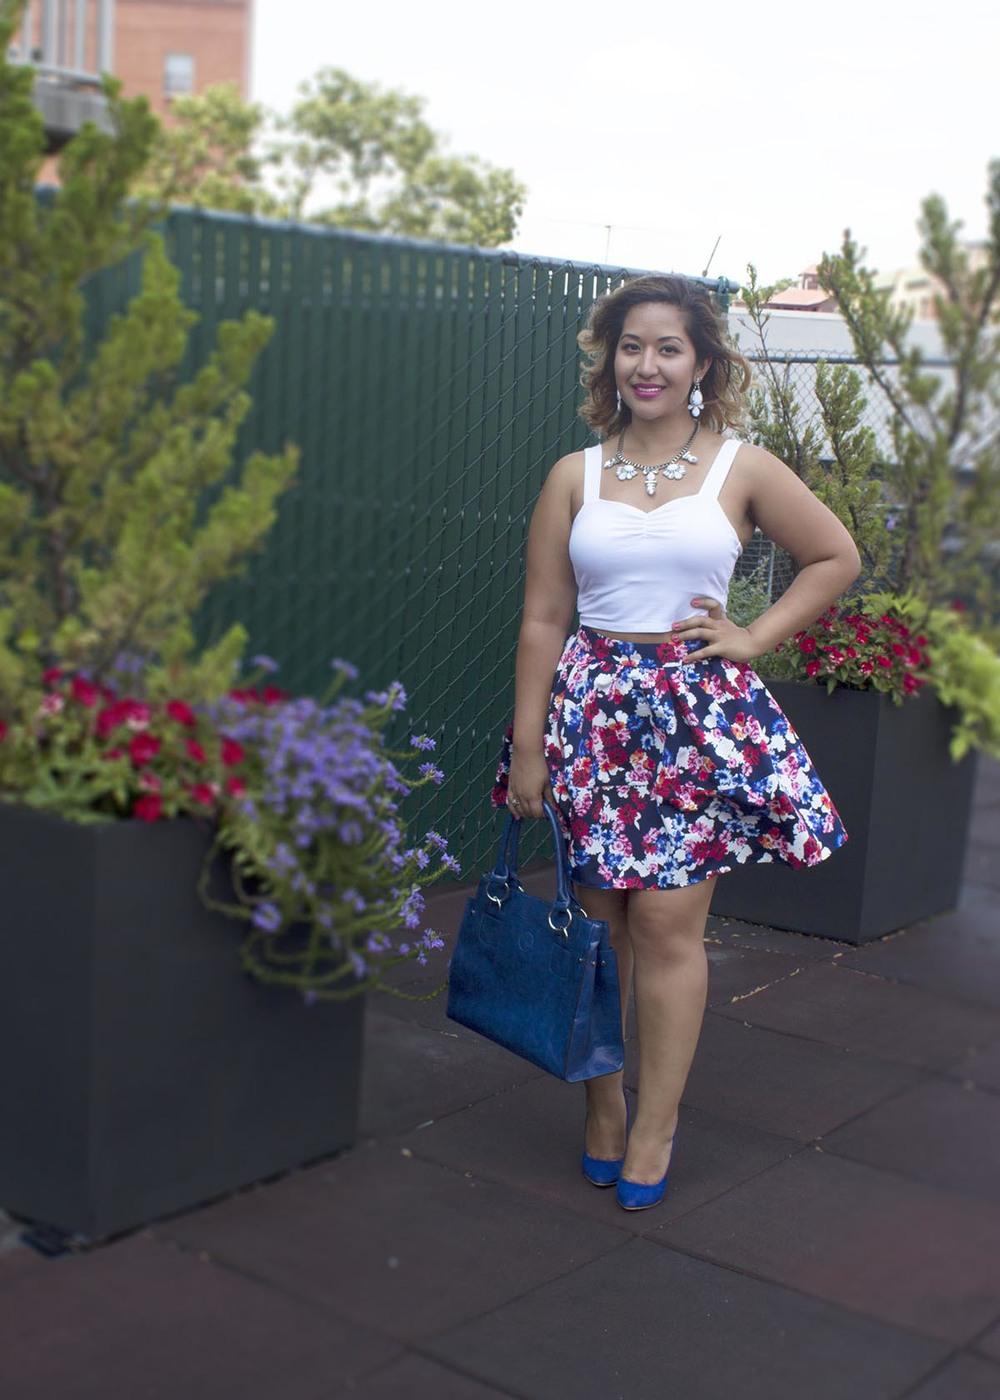 Floral Skirt2.jpg